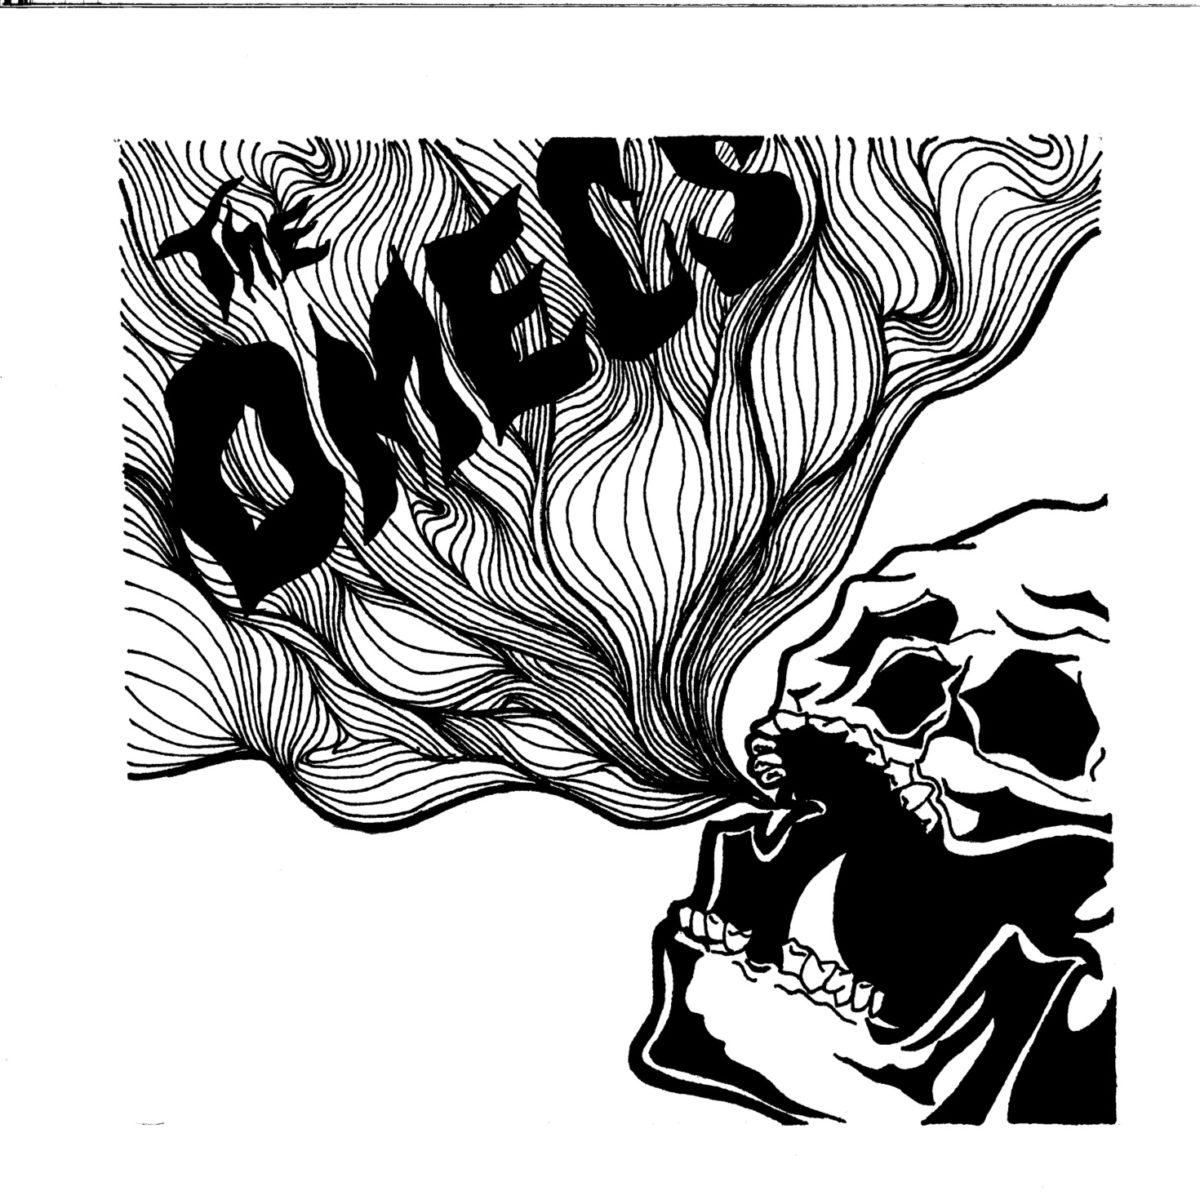 The Omecs | The Omecs | 3hive.com